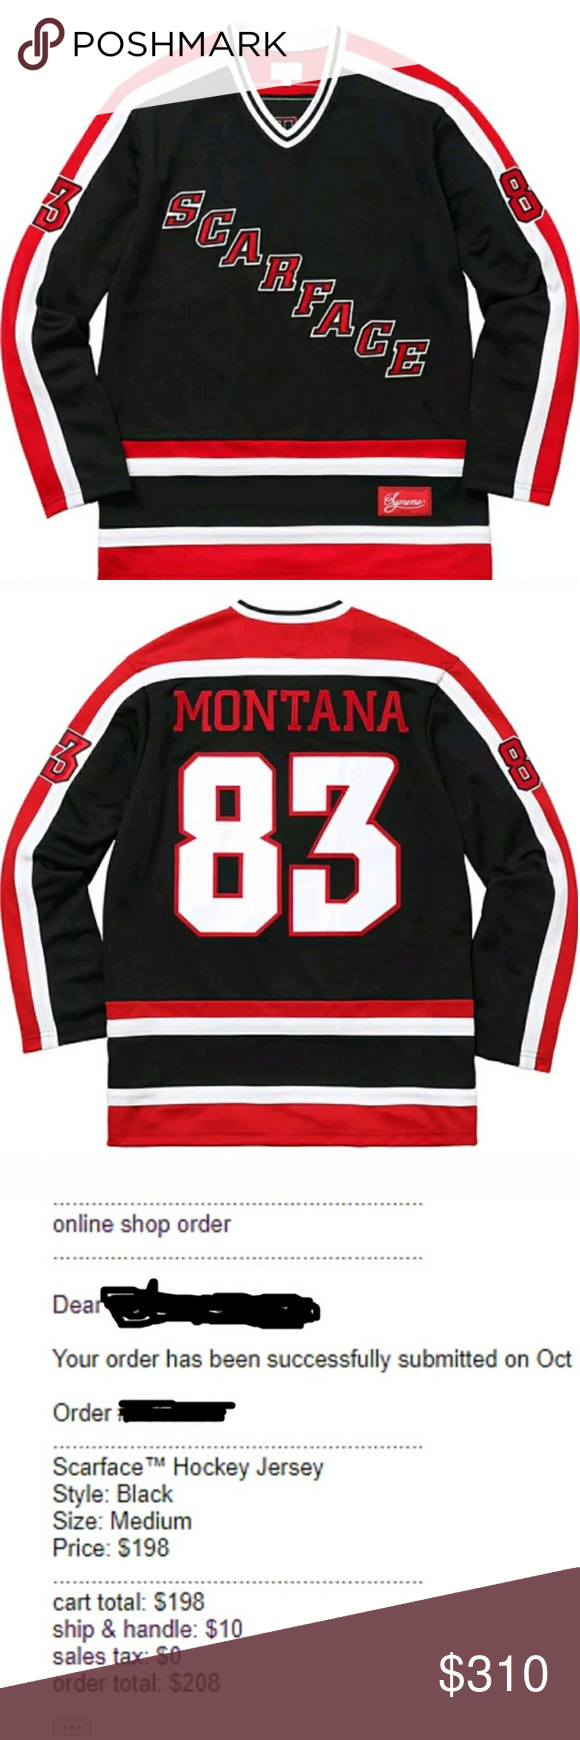 Supreme Scarface Hockey Jersey Medium Hockey Jersey Supreme Shirt Scarface [ 1740 x 580 Pixel ]